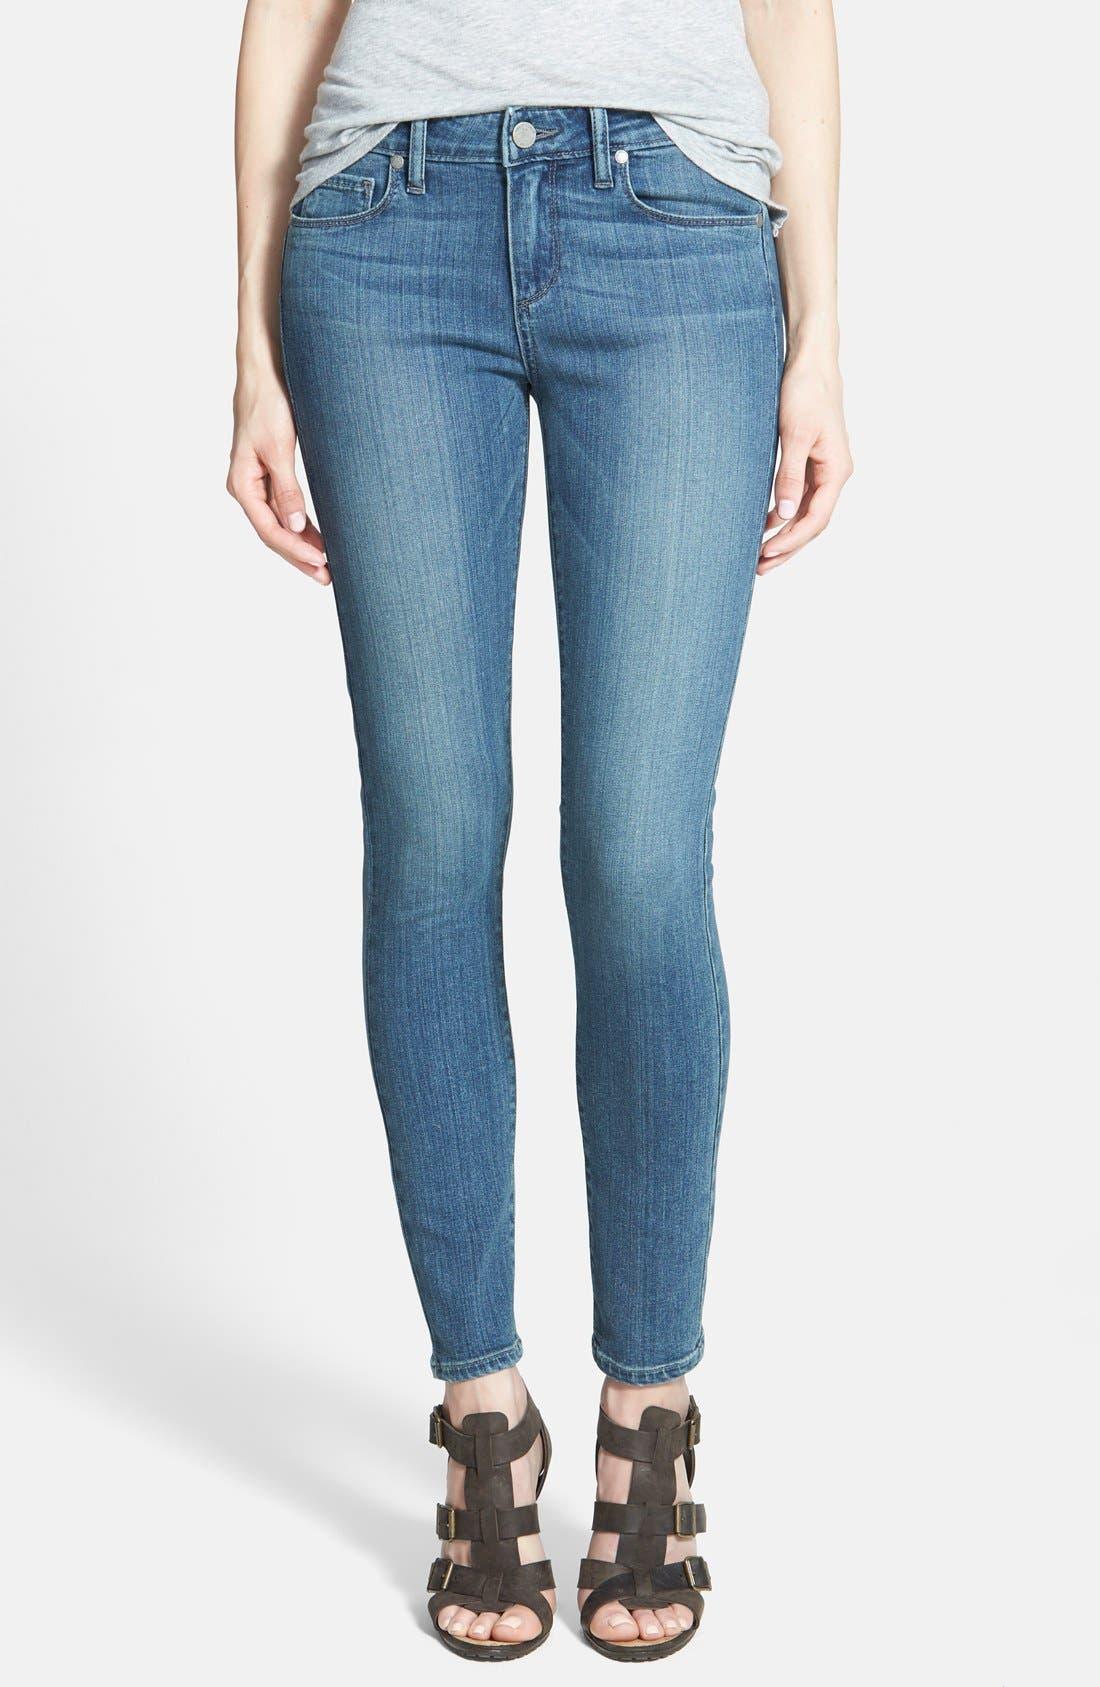 Main Image - Paige Denim 'Verdugo' Low Rise Ankle Skinny Jeans (Dazeley)